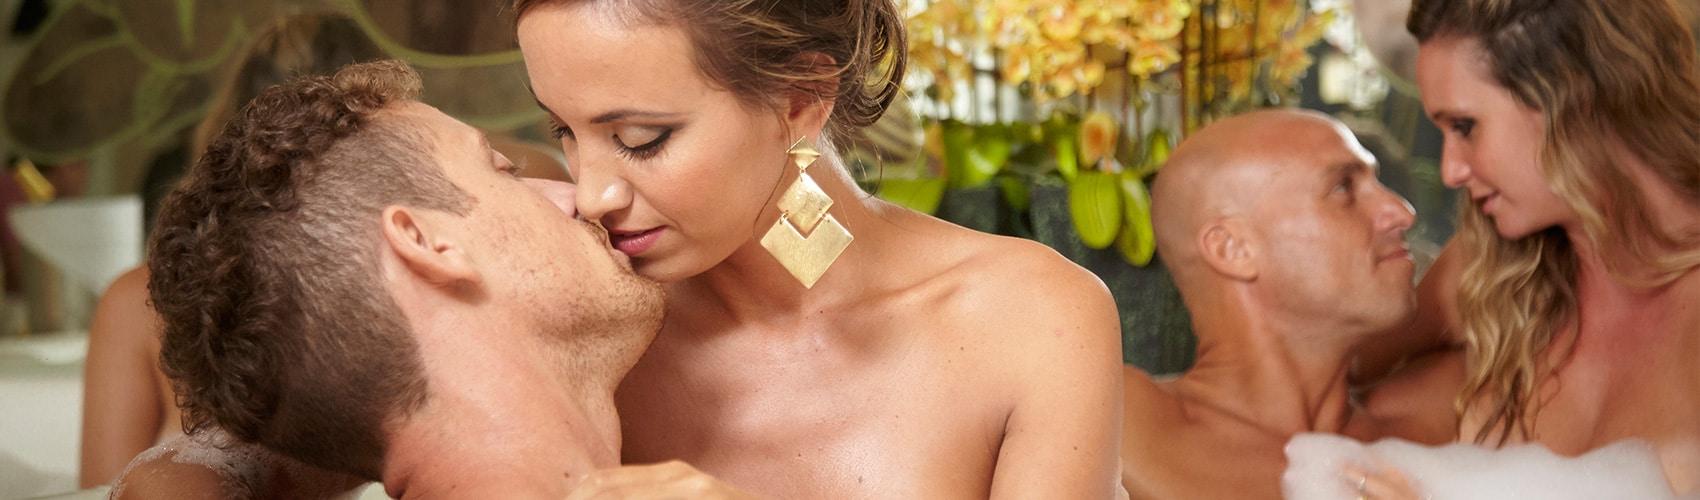 desire-riviera-couples-kissing-b.jpg